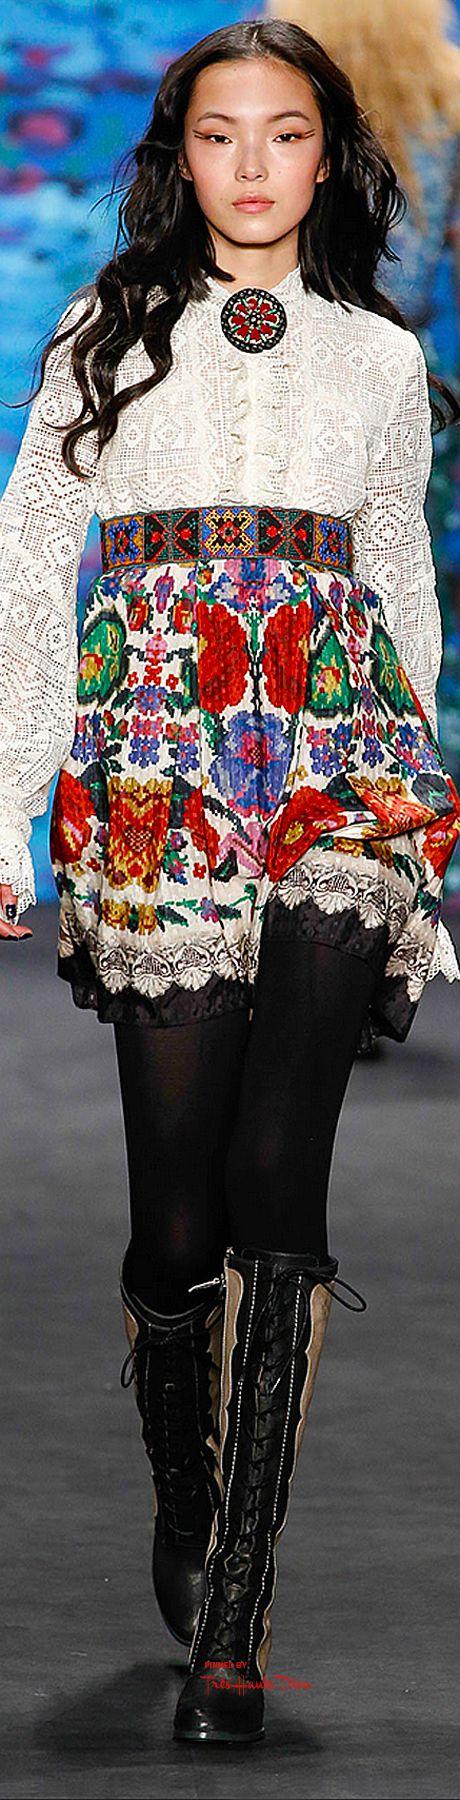 Anna Sui Fall 2015 Ready-to-Wear Fashion Show